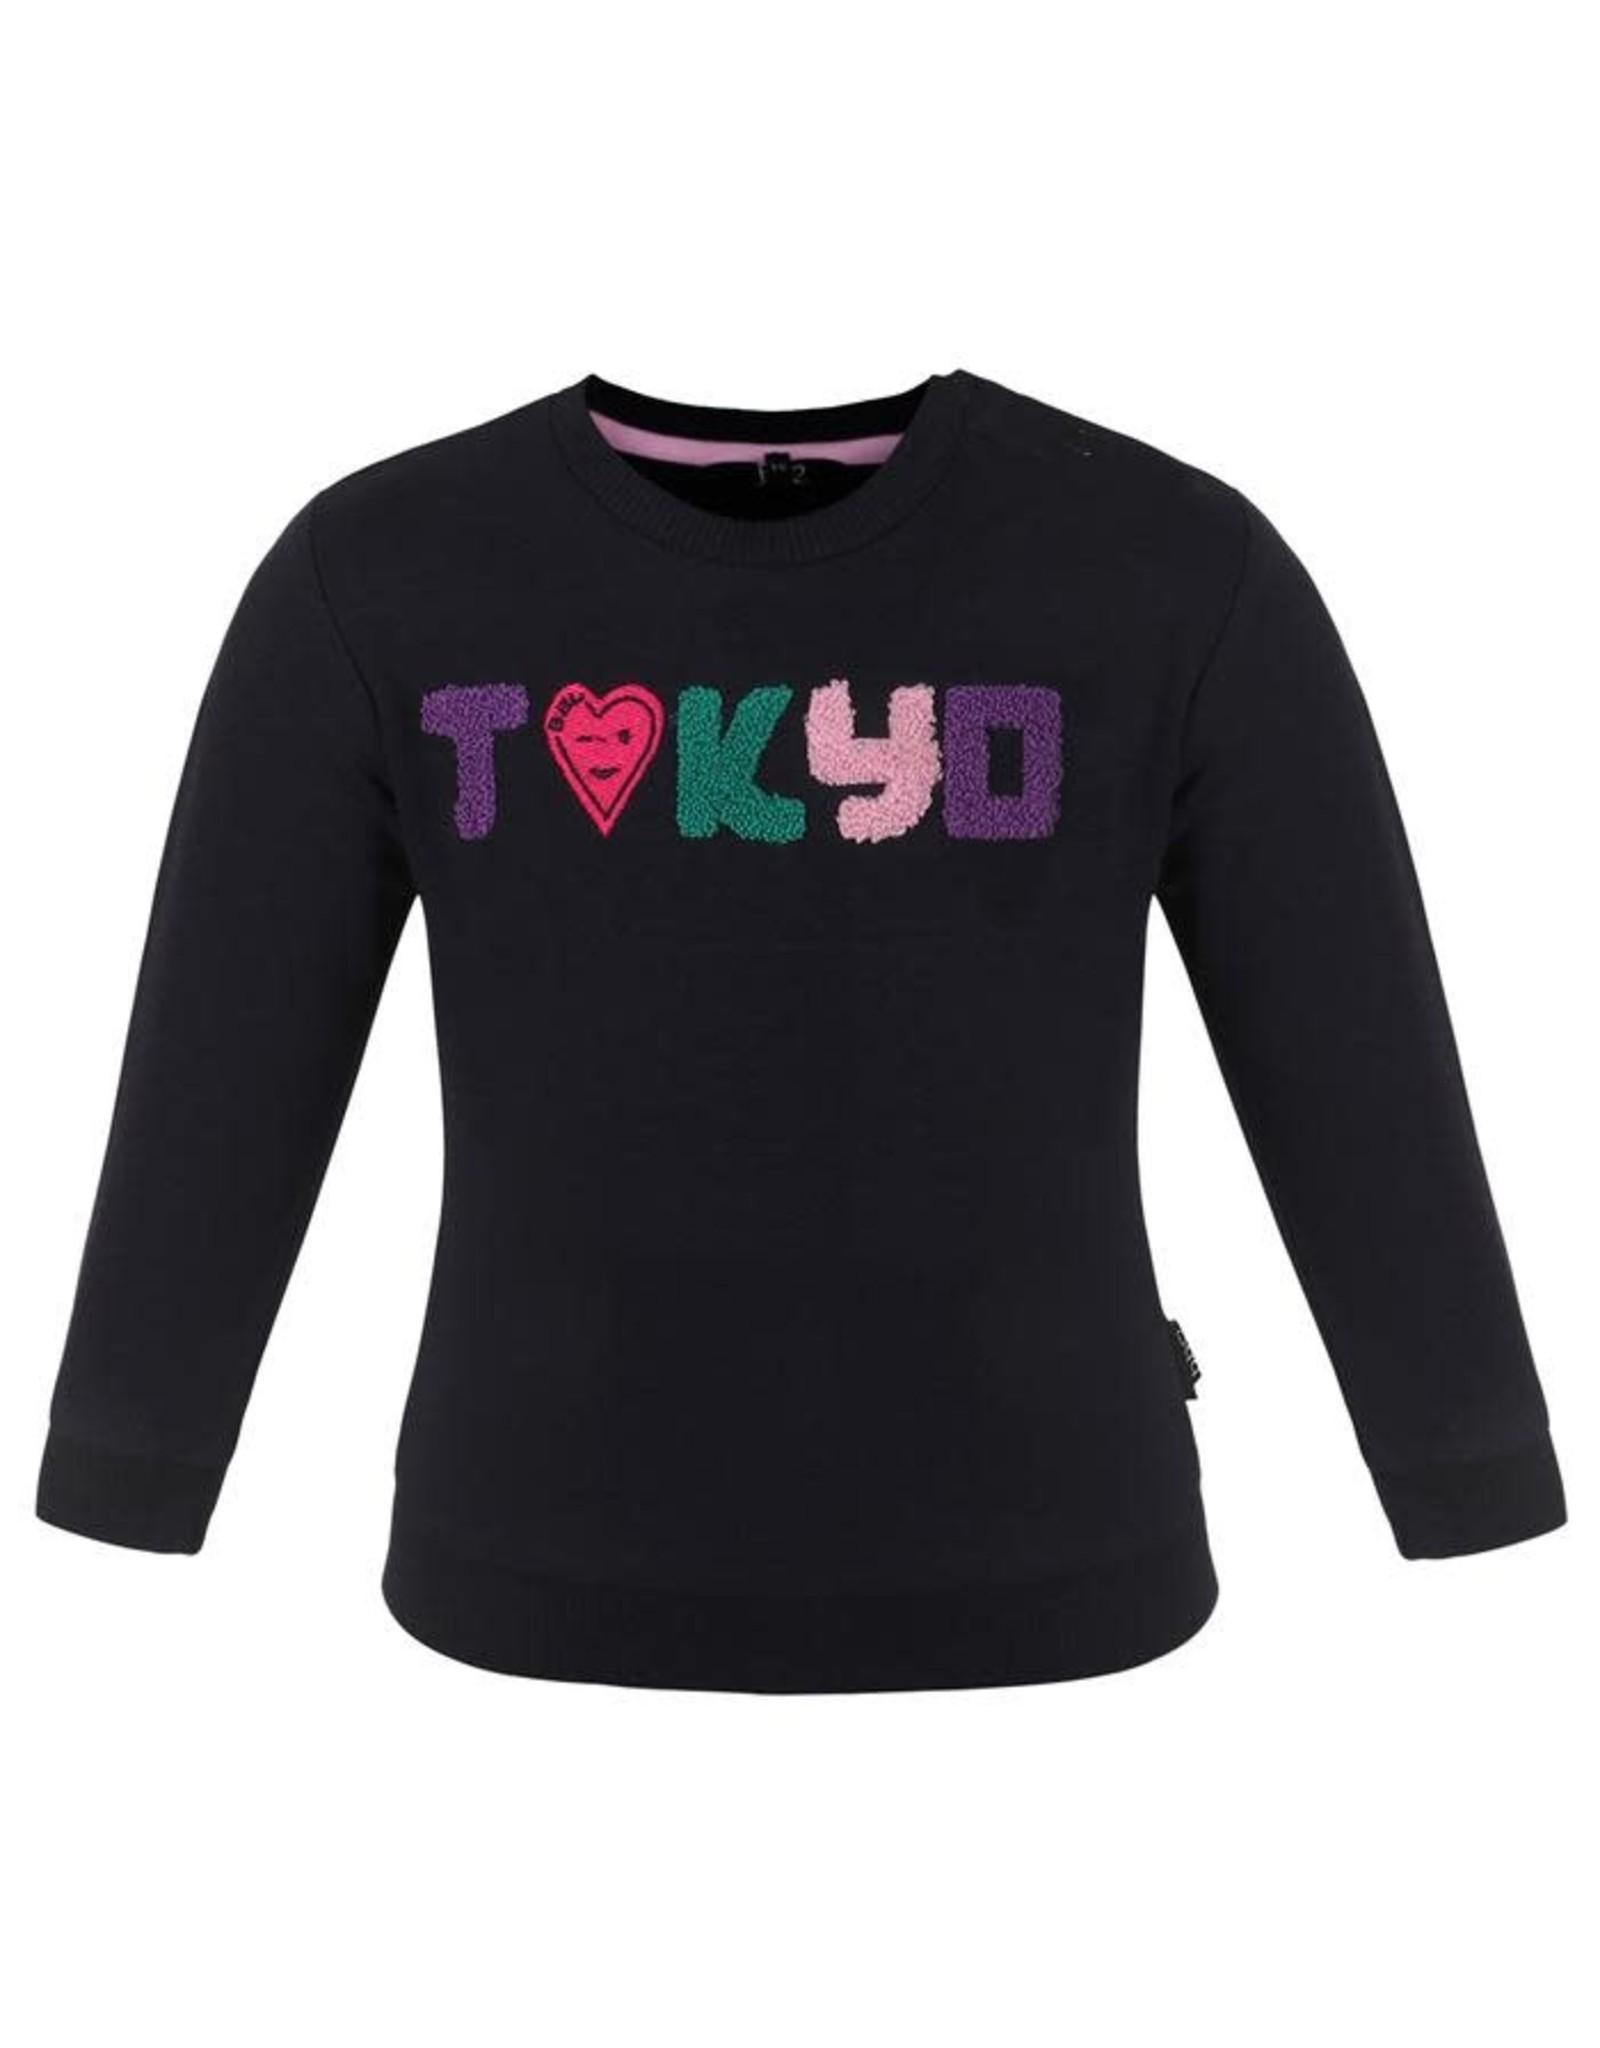 Beebielove 2544 Sweater